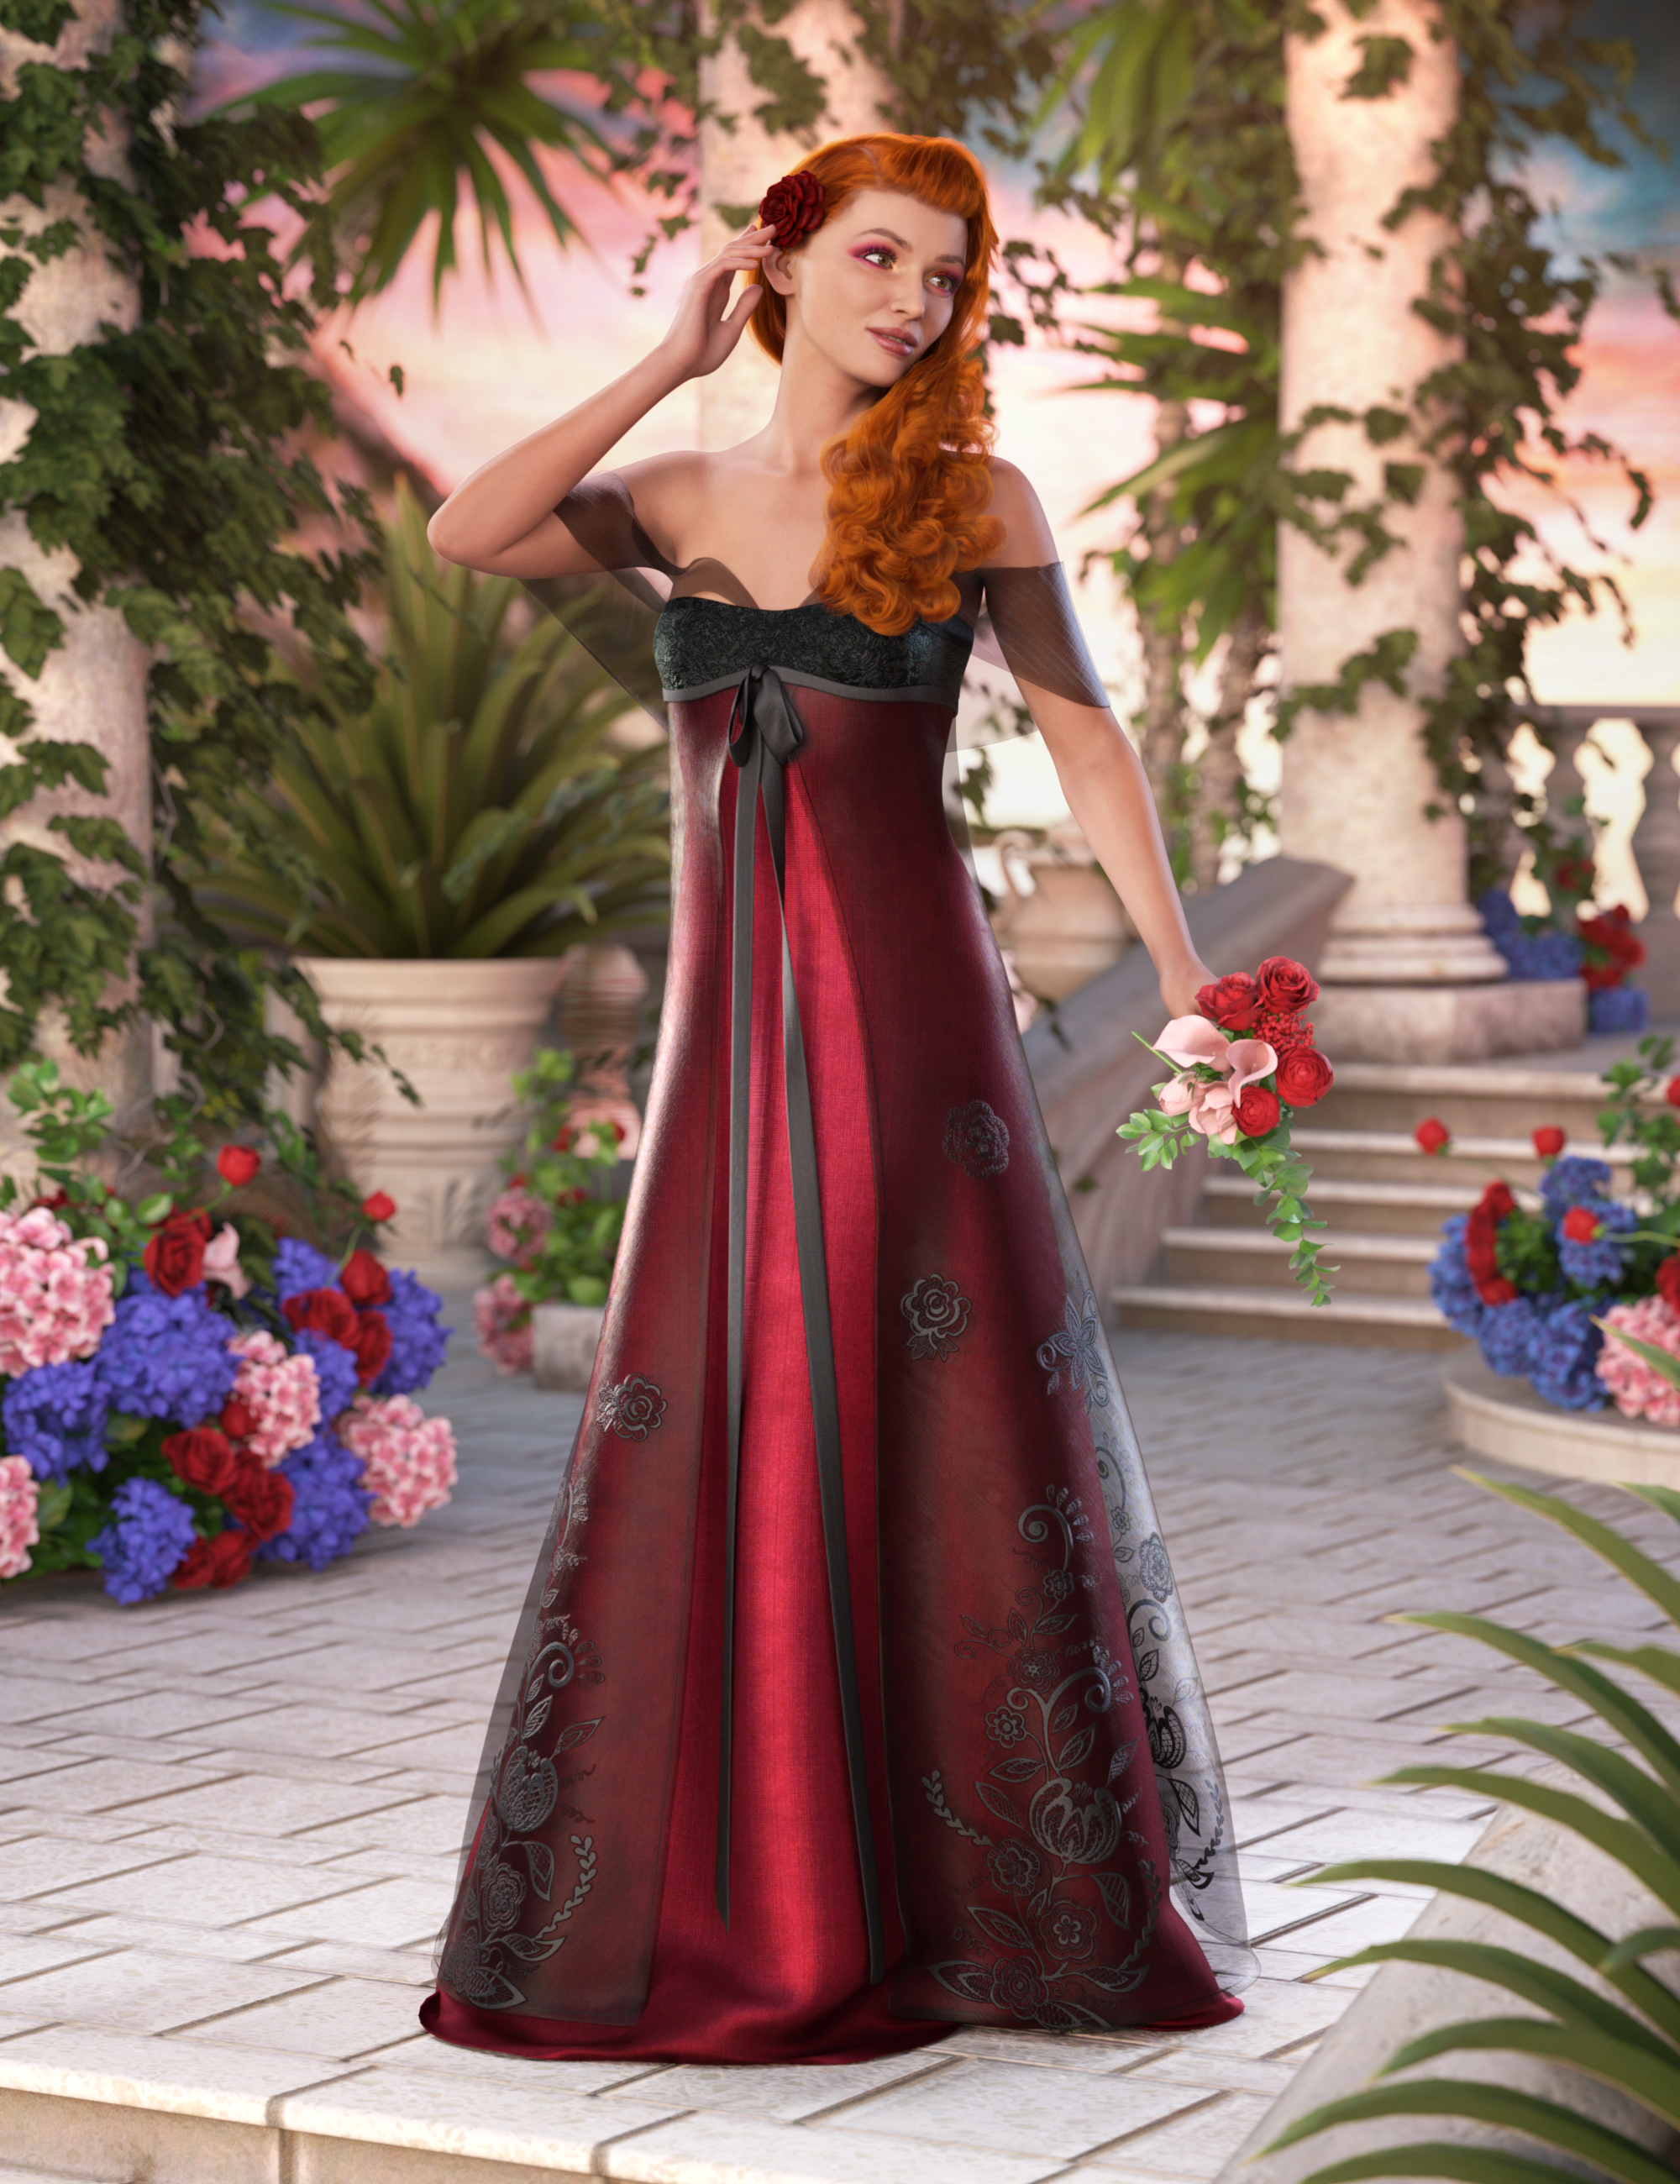 dForce Enchanted Splendor for Genesis 8 and 8.1 Females by: Barbara BrundonSade, 3D Models by Daz 3D